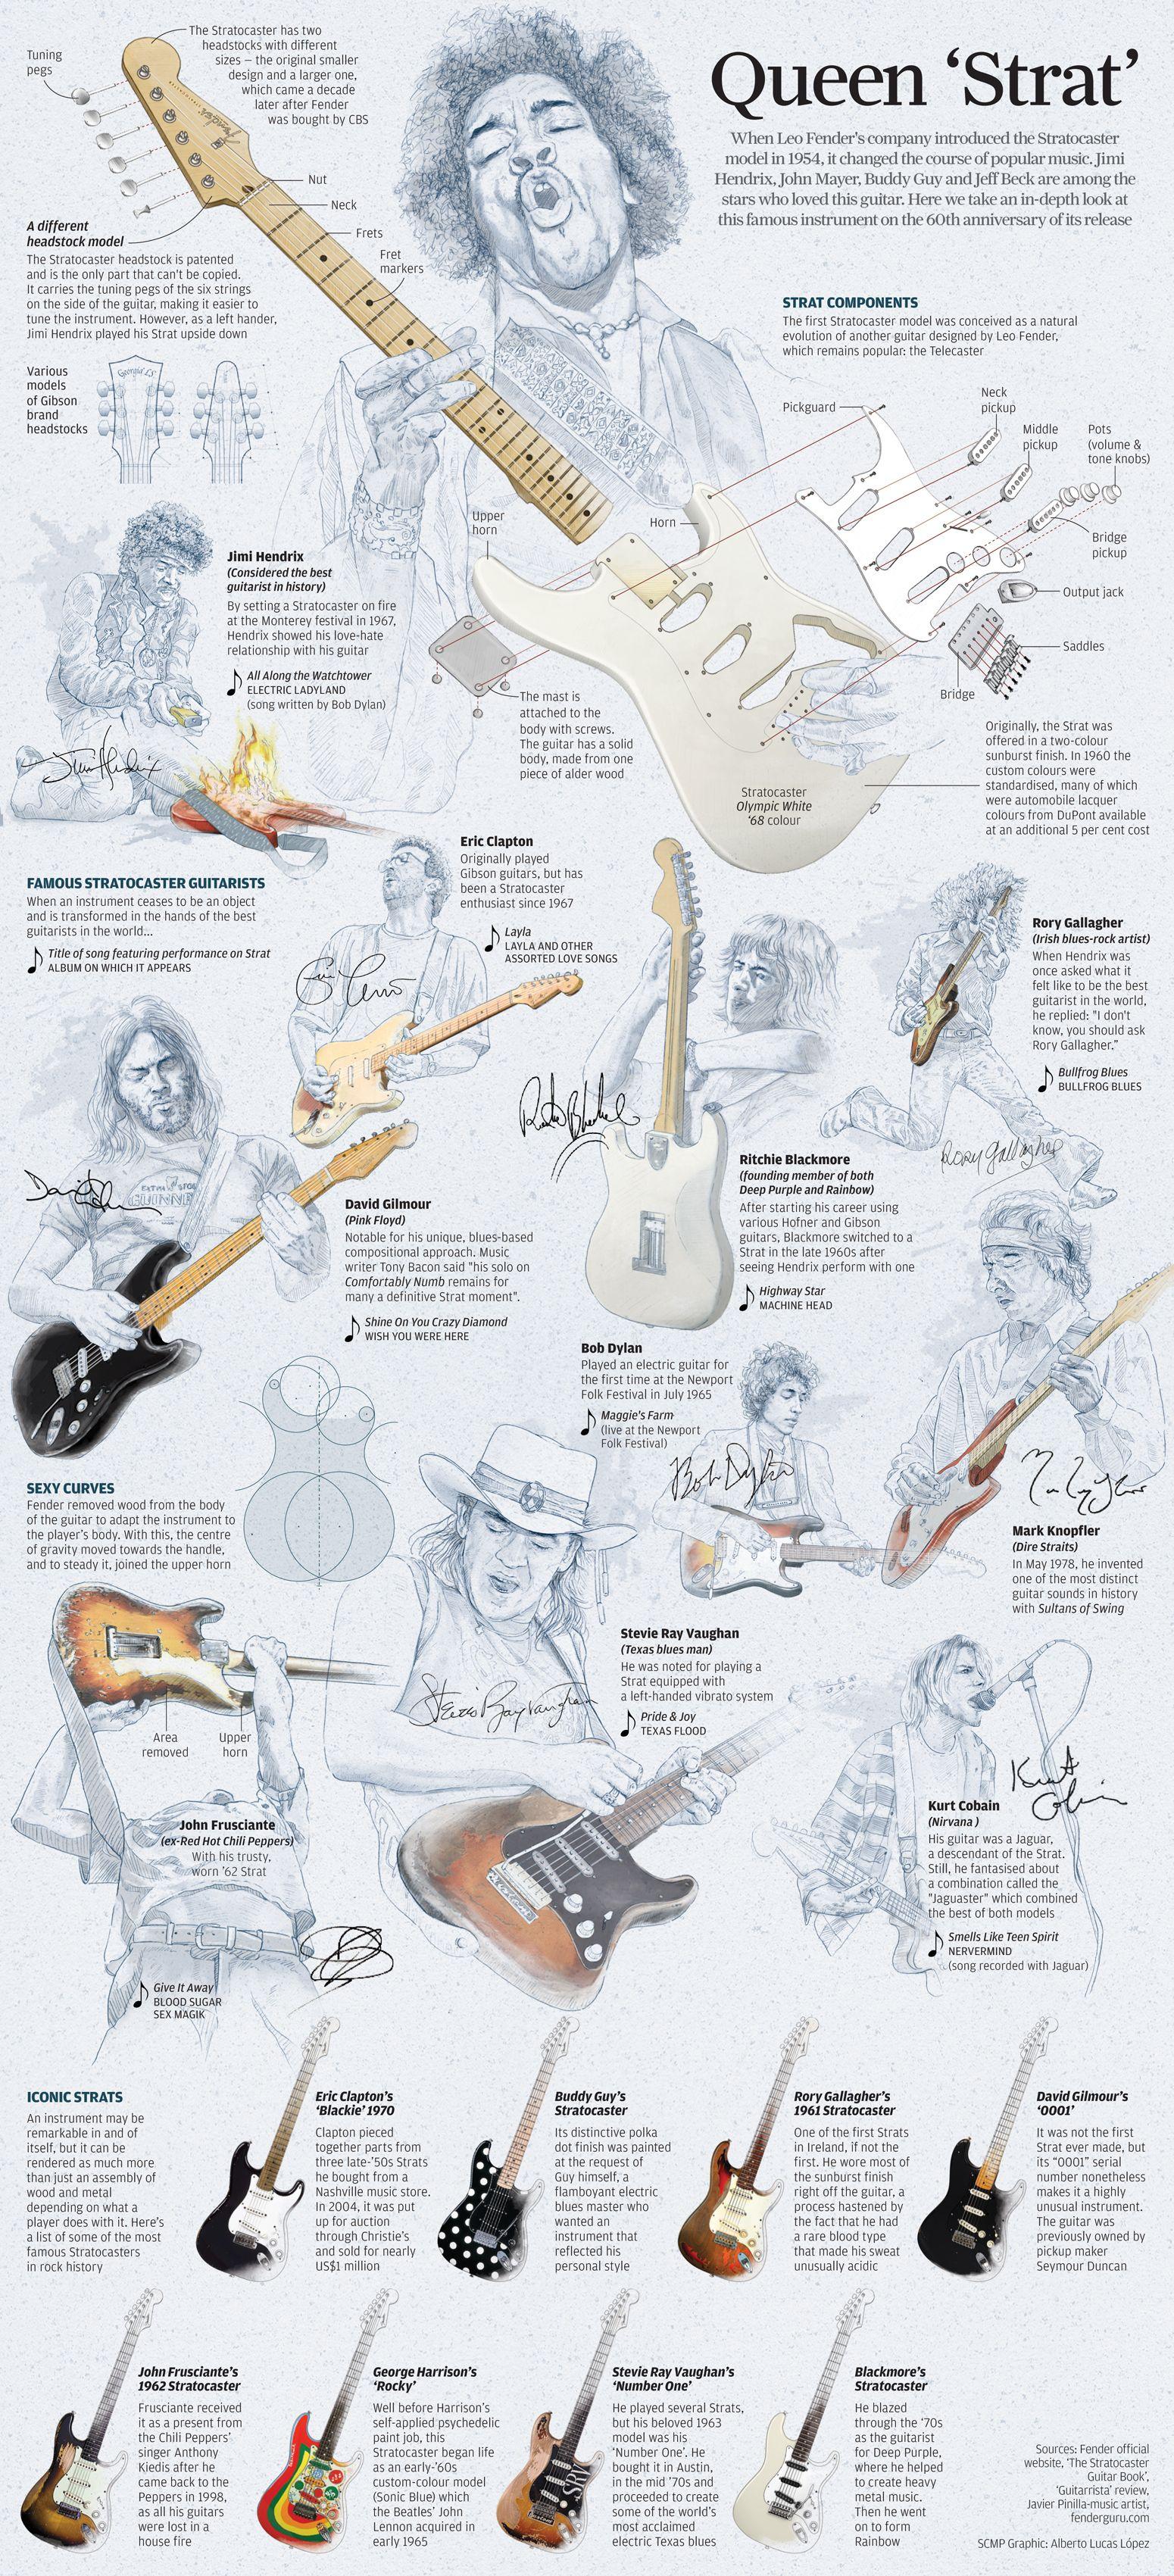 [SCHEMATICS_48YU]  Story of the Stratocaster | Fender stratocaster, Fender guitars, Music  guitar | Bullfrog Blues Strat Guitar Wiring Diagram |  | Pinterest